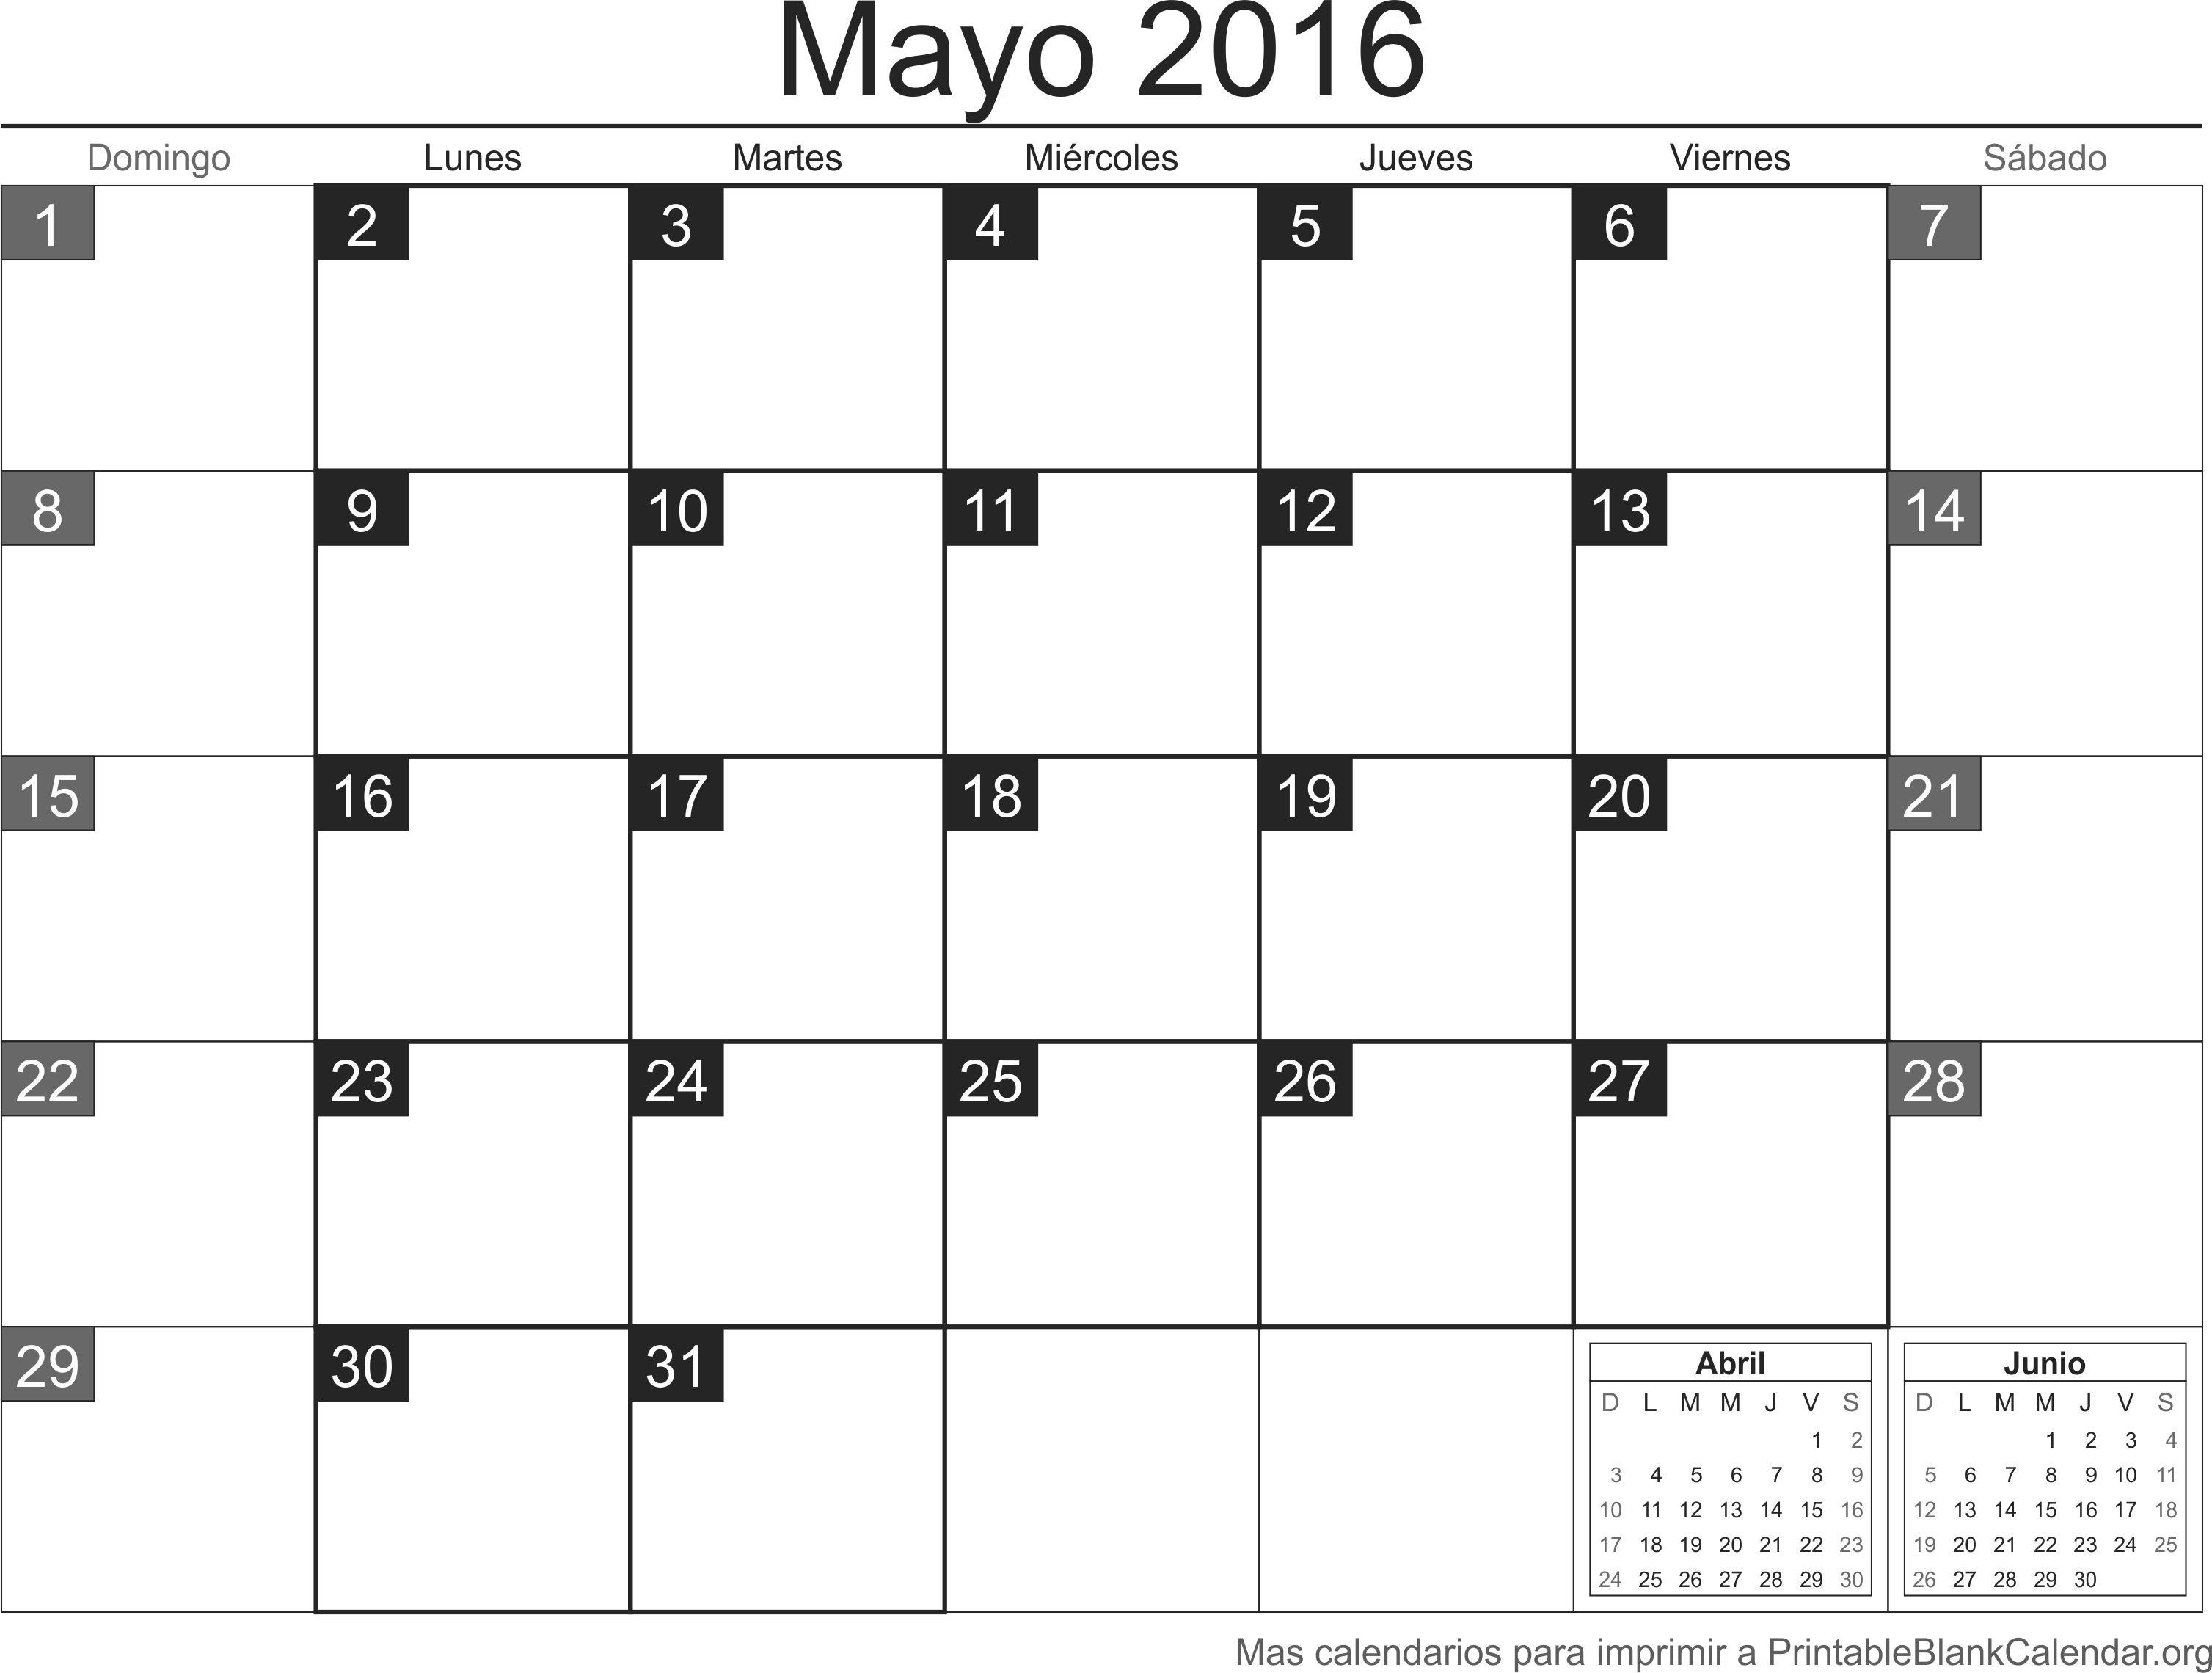 Calendario May 2016 para imprimir